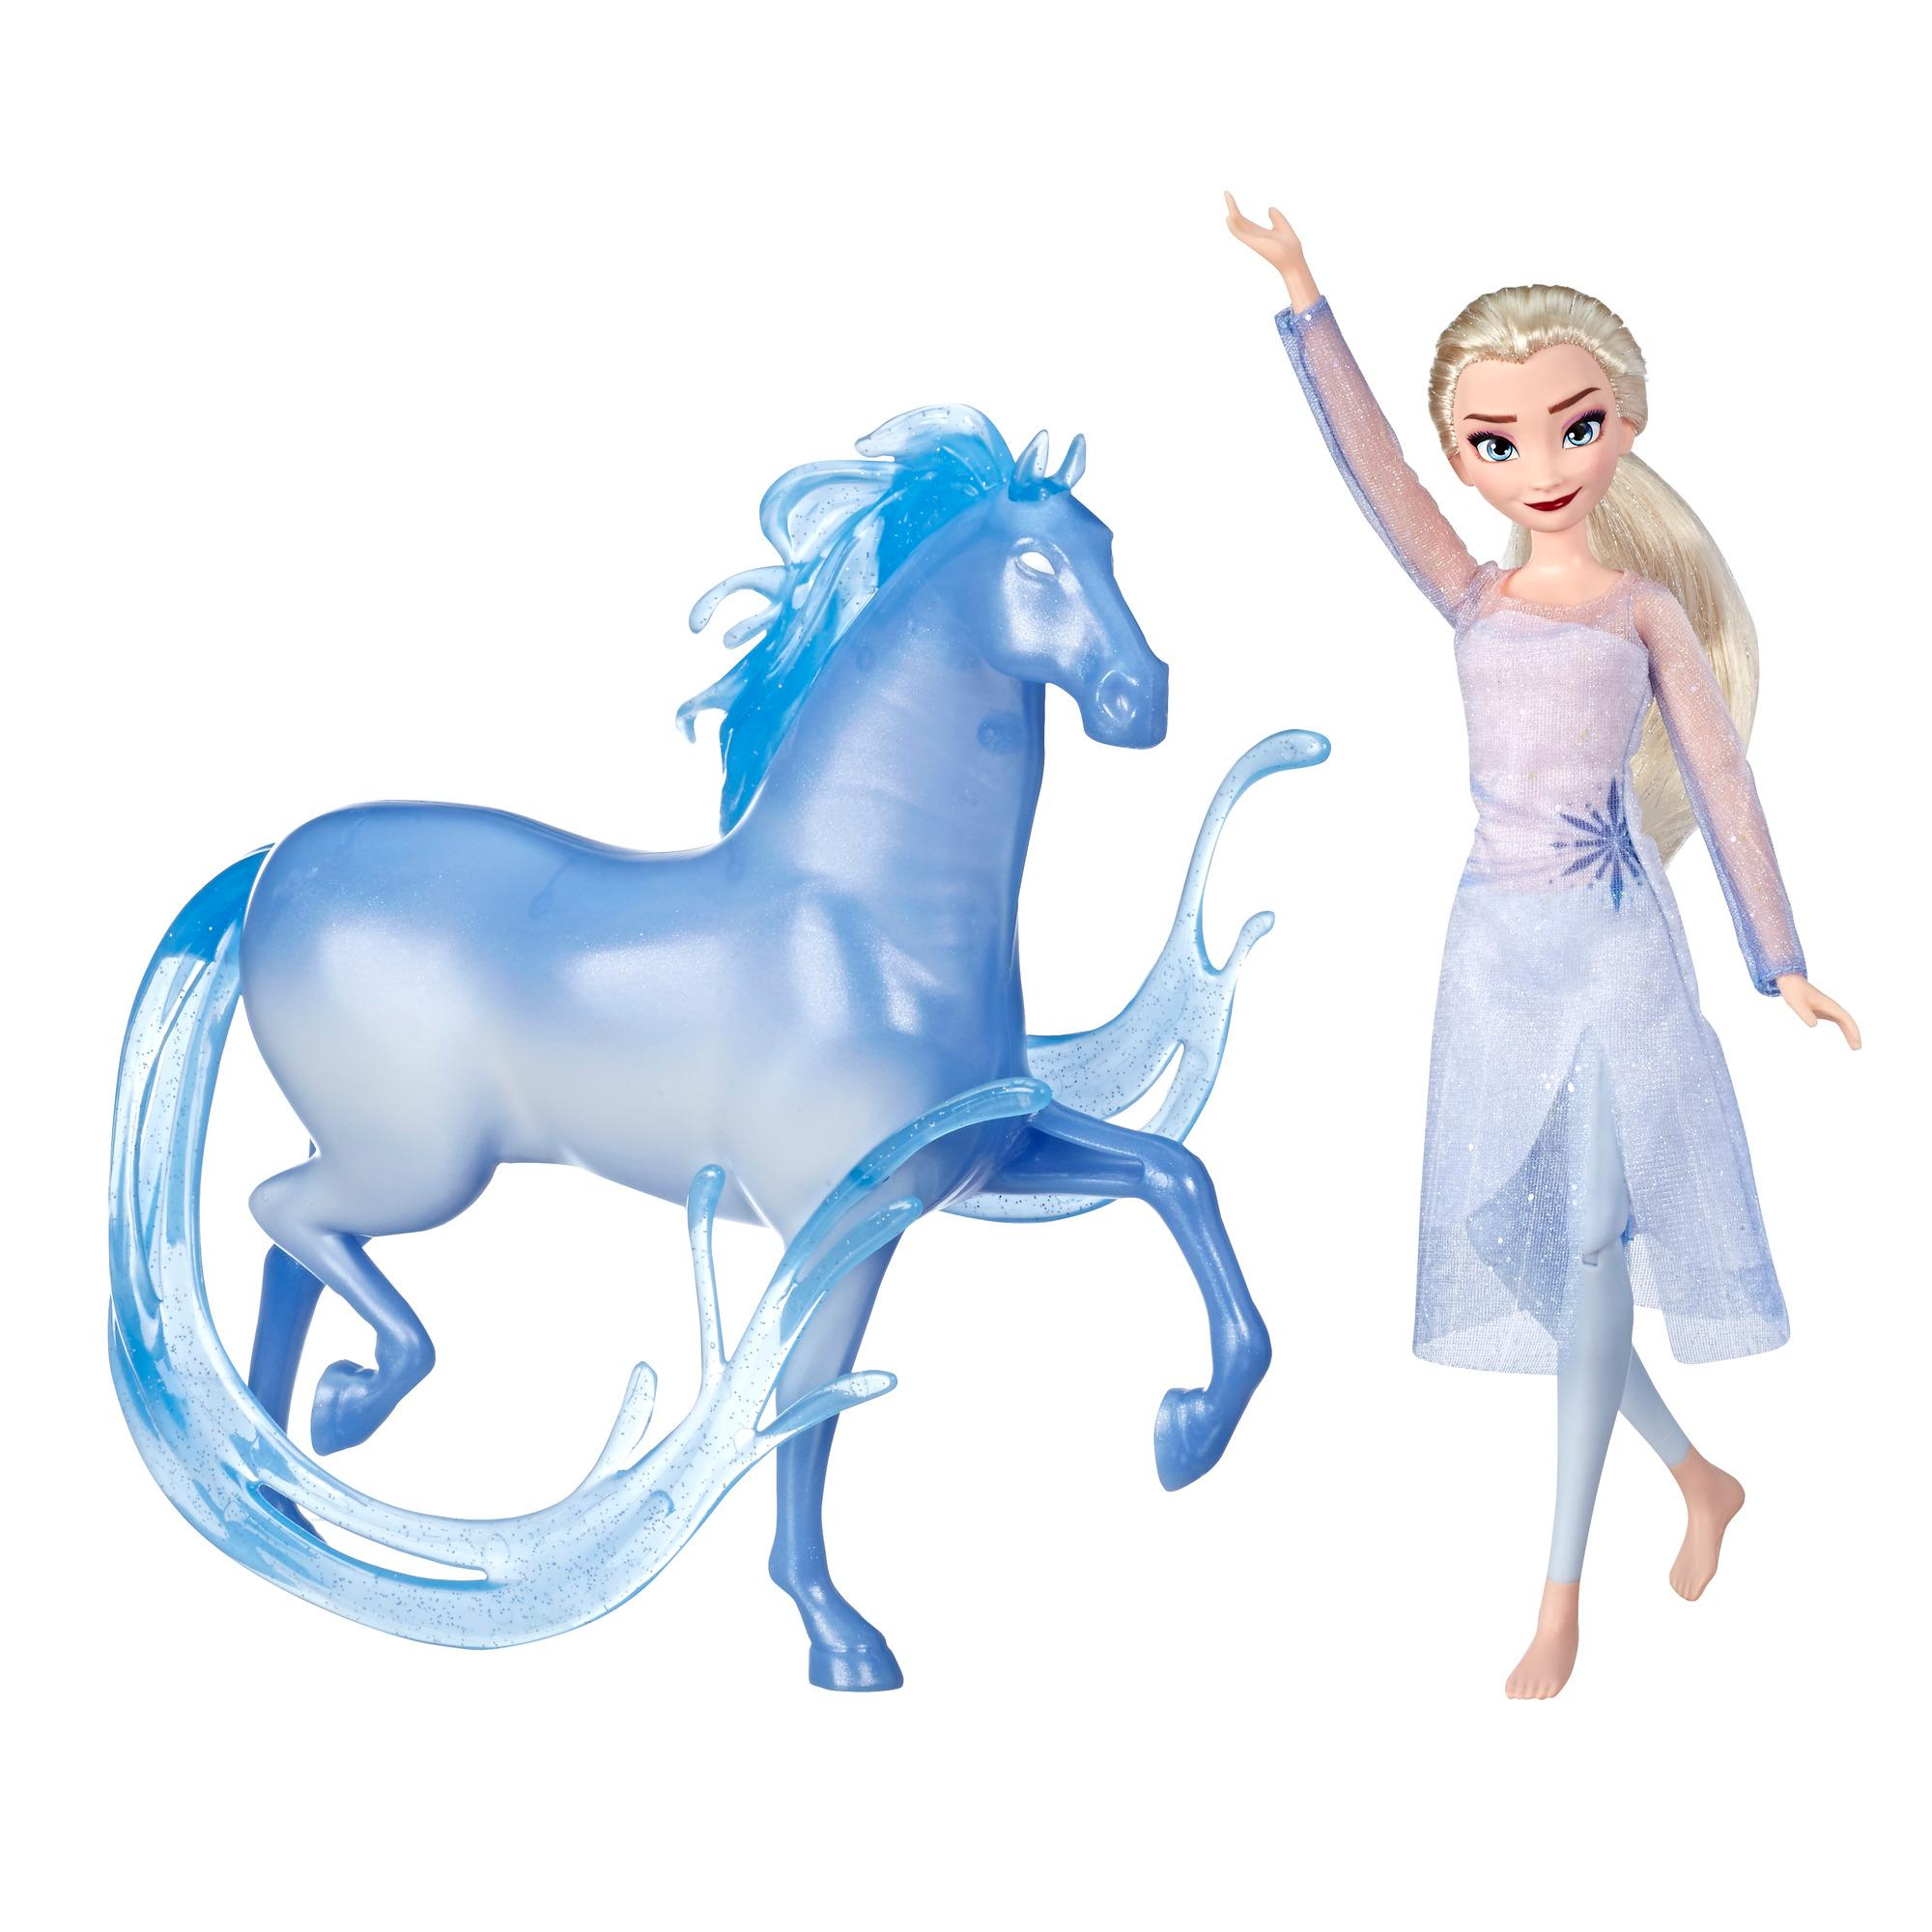 Disney Frozen Elsa Fashion Doll and Nokk Figure Inspired by Frozen 2